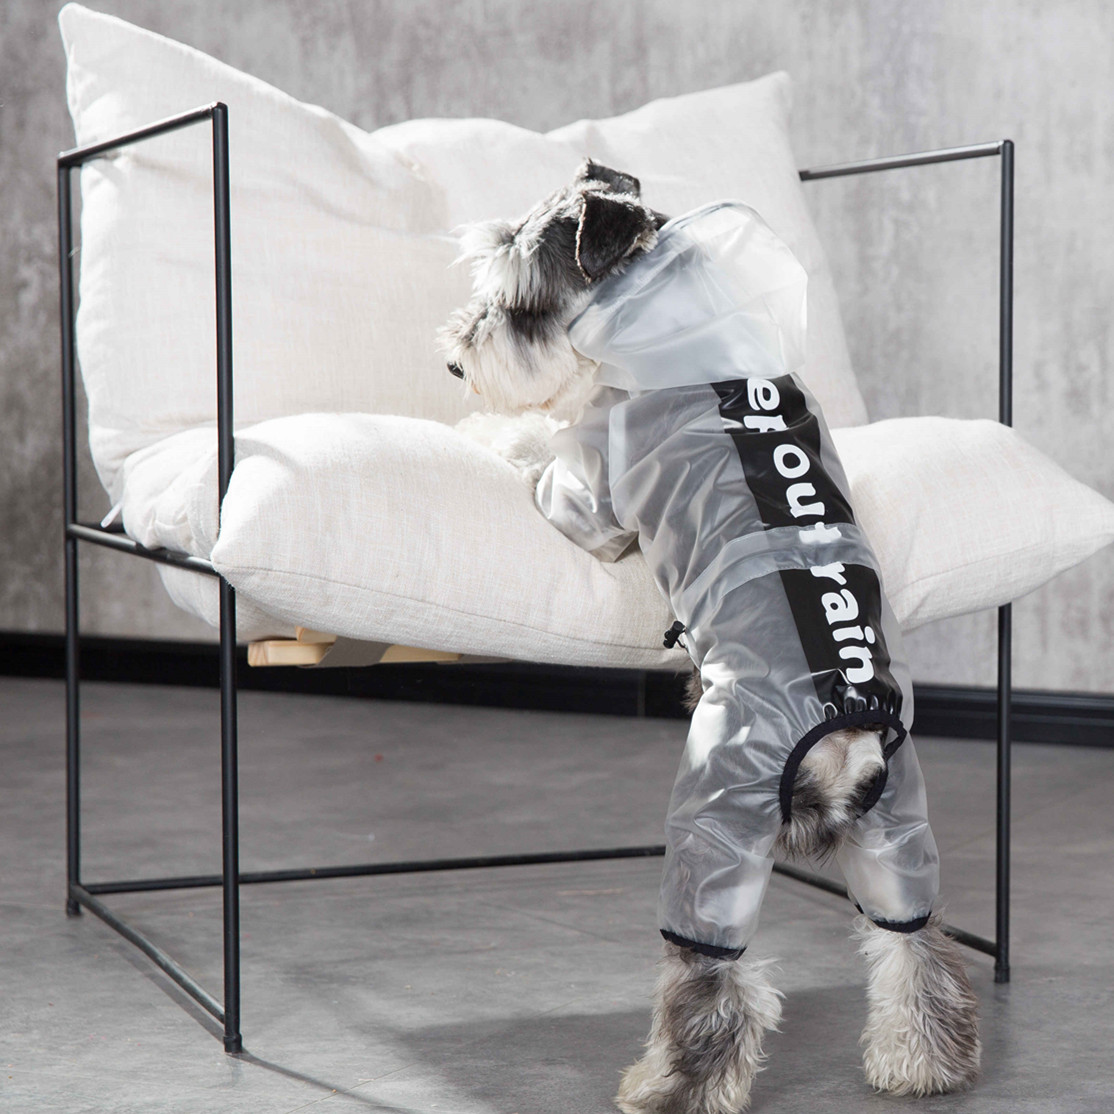 Dog Raincoat Hooded Rain Suit For Dog Translucent Raincoat Dog Raincoat Hood For Small Dogs Chihuahua Yorkshire